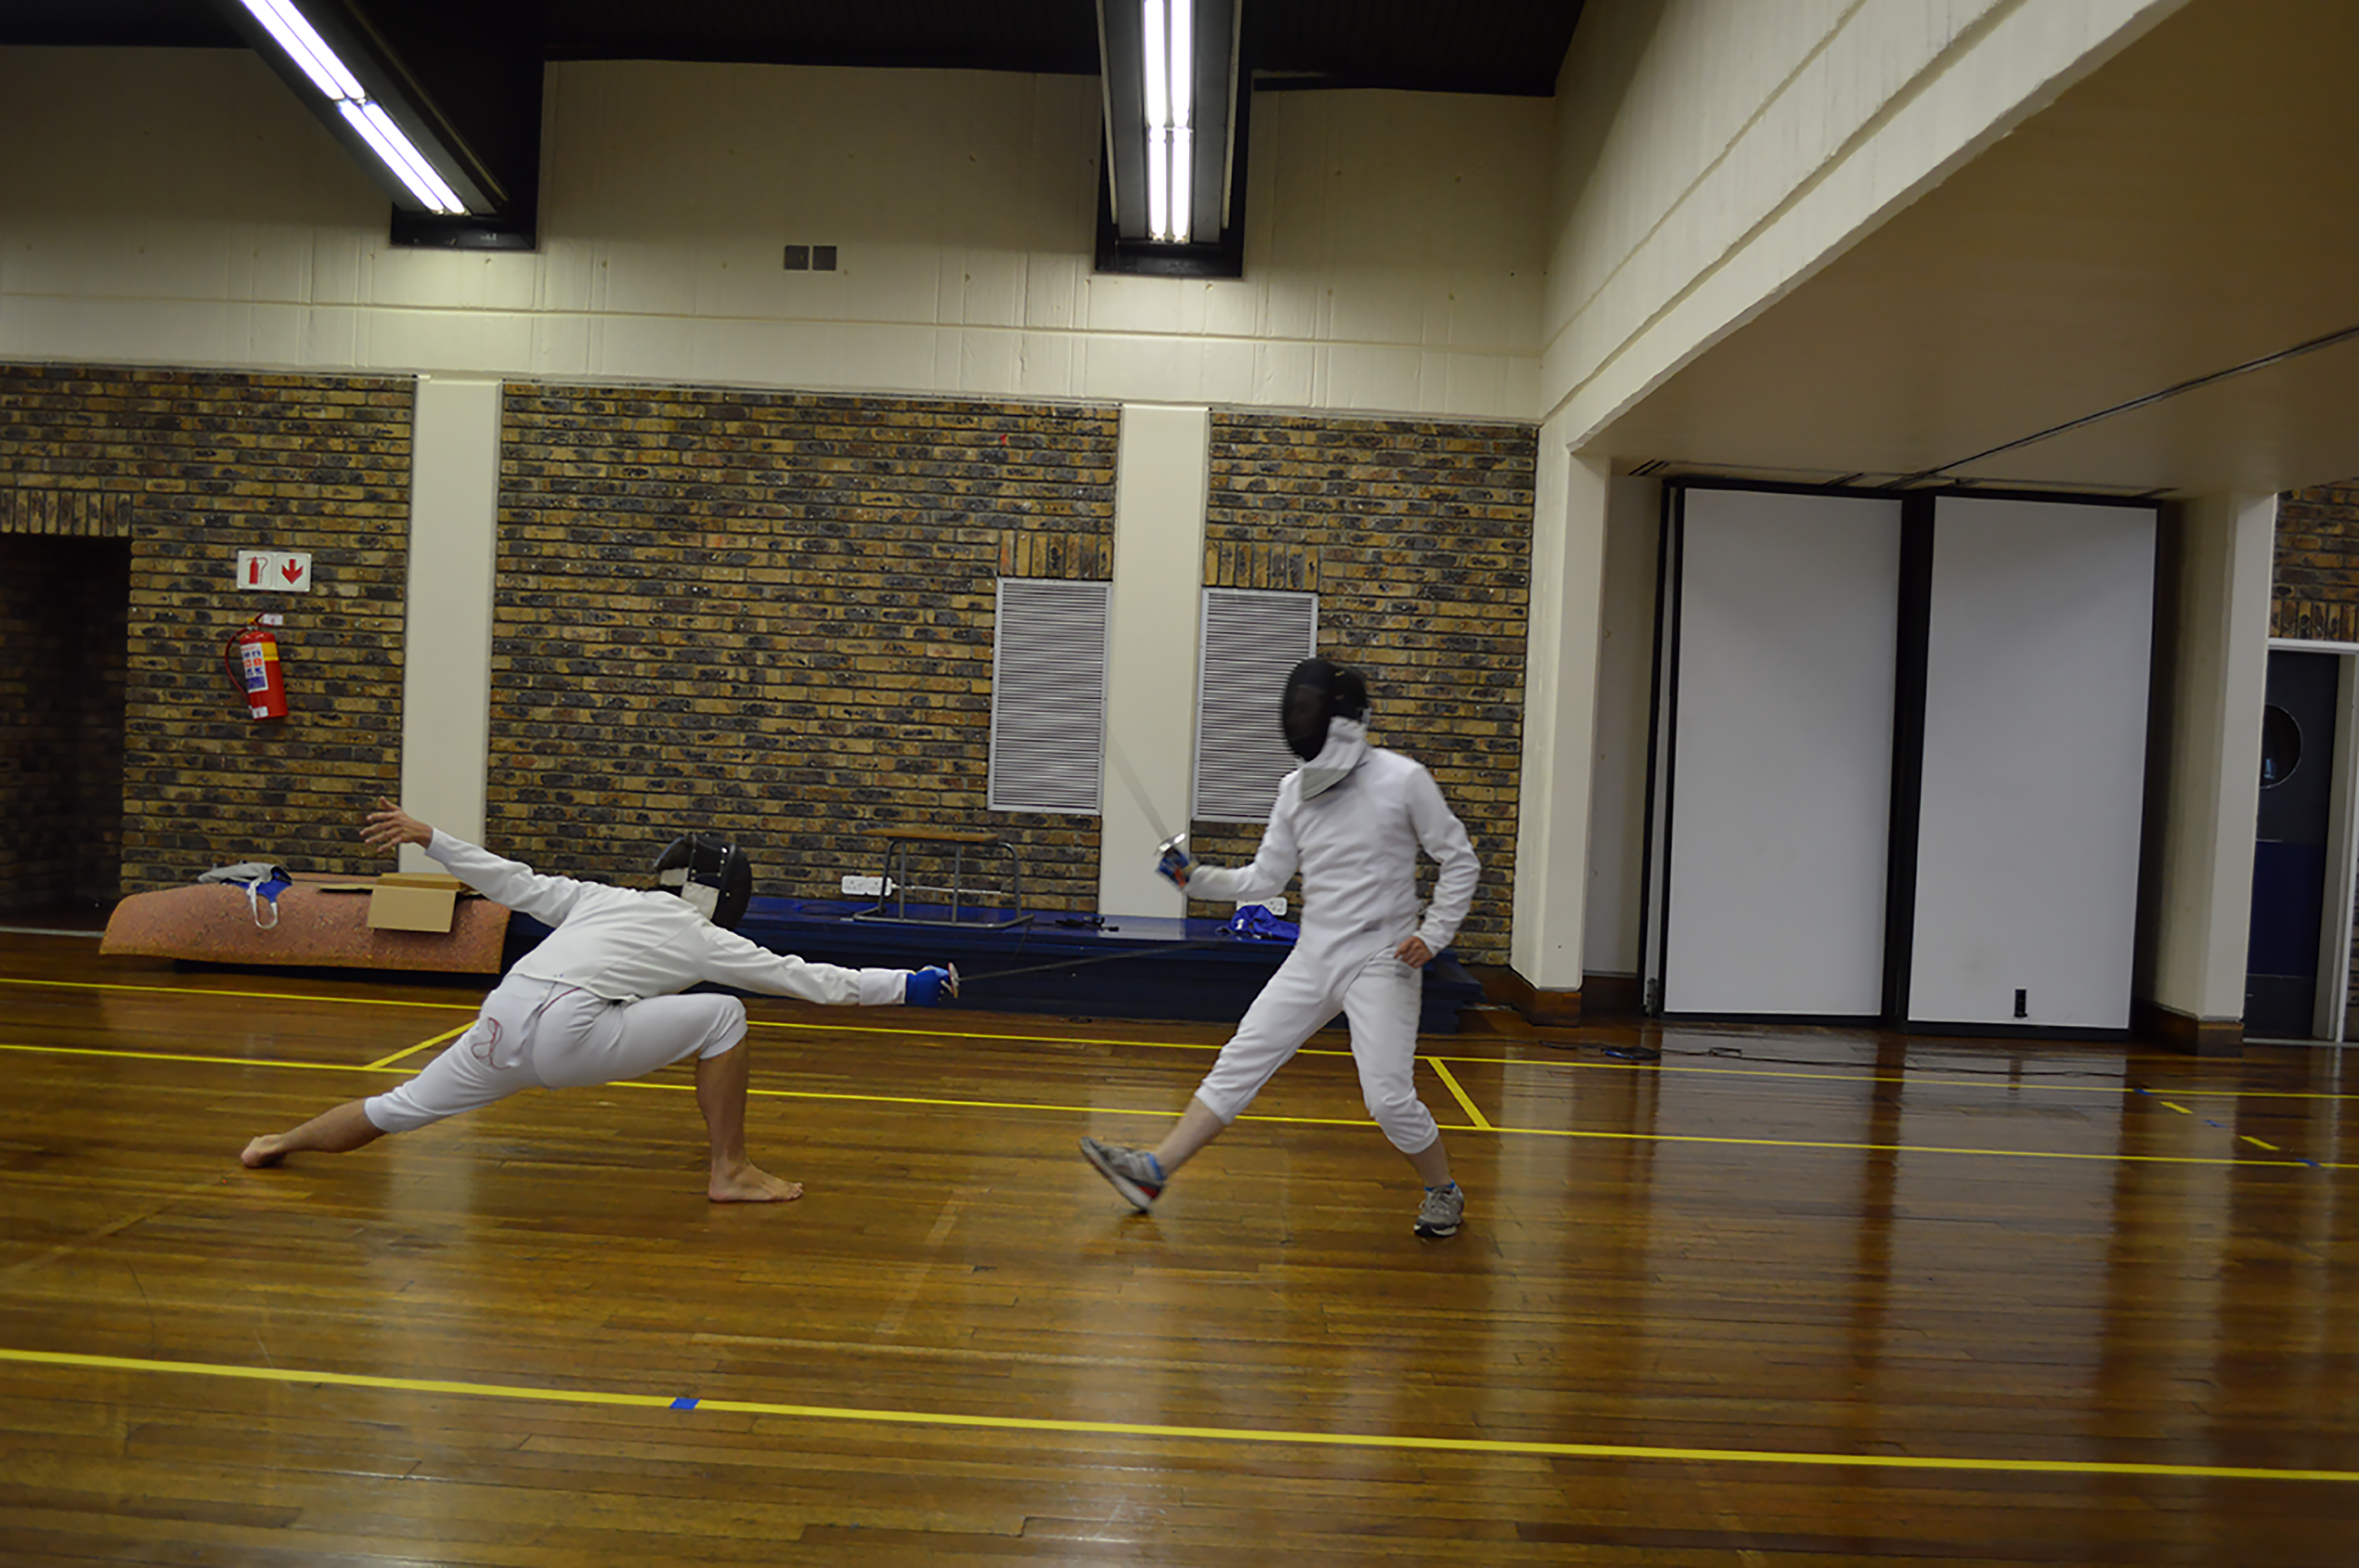 Wits Fencing Club Stays En Garde Wits Vuvuzela